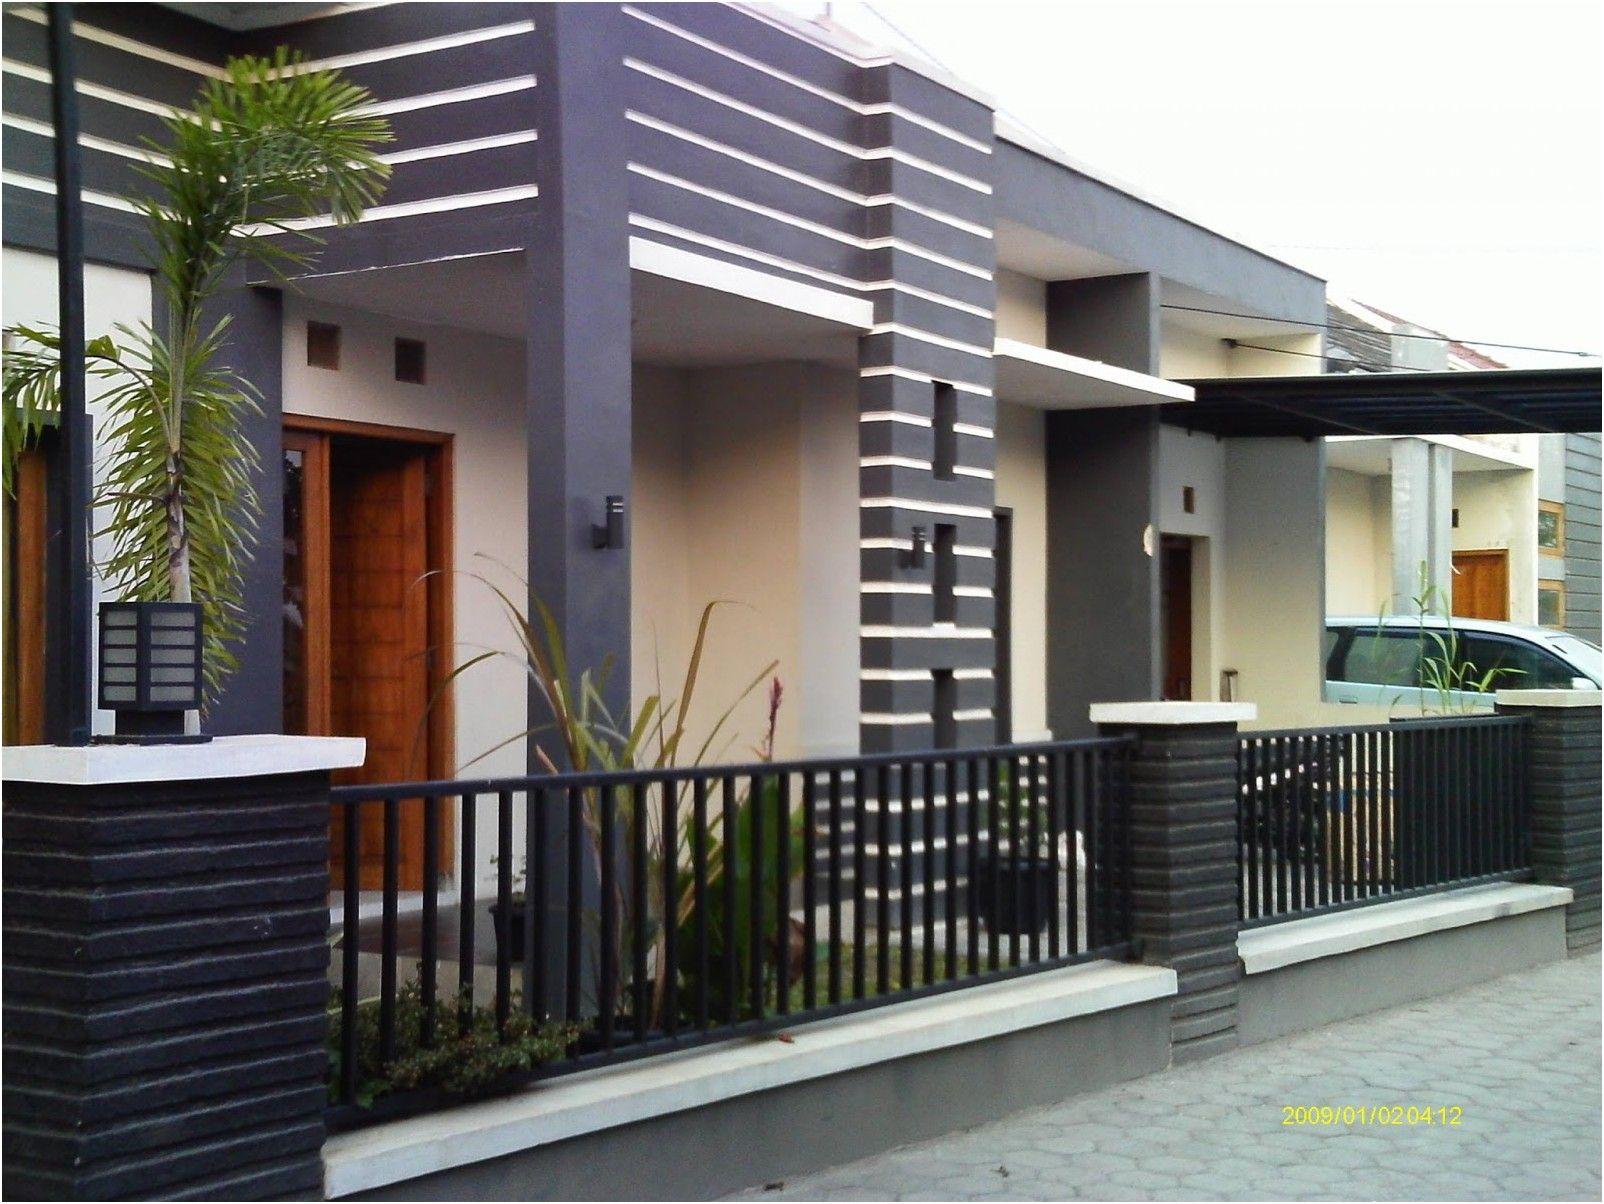 Desain Pagar Rumah Minimalis Modern | Design Minimalis ala ...